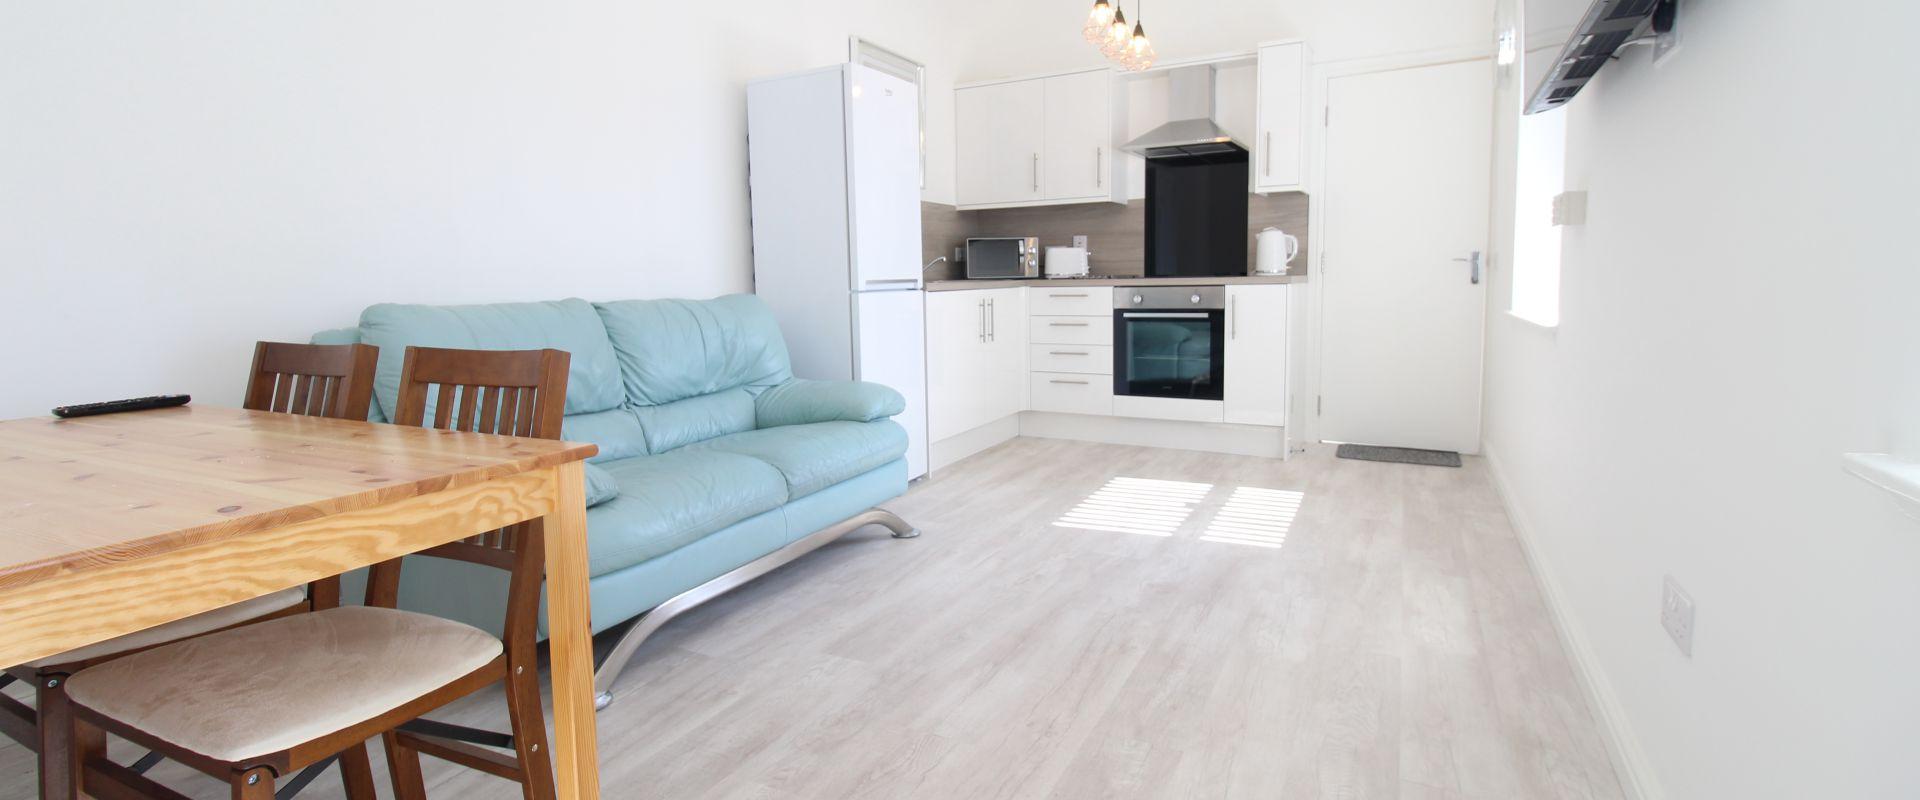 ARD-Properties-Development-Sites-Buy-Homes-Rent-Aberdeenshire-Rentals-Apartment-C-Loanhead-Terrace-Aberdeen-Banner (1)